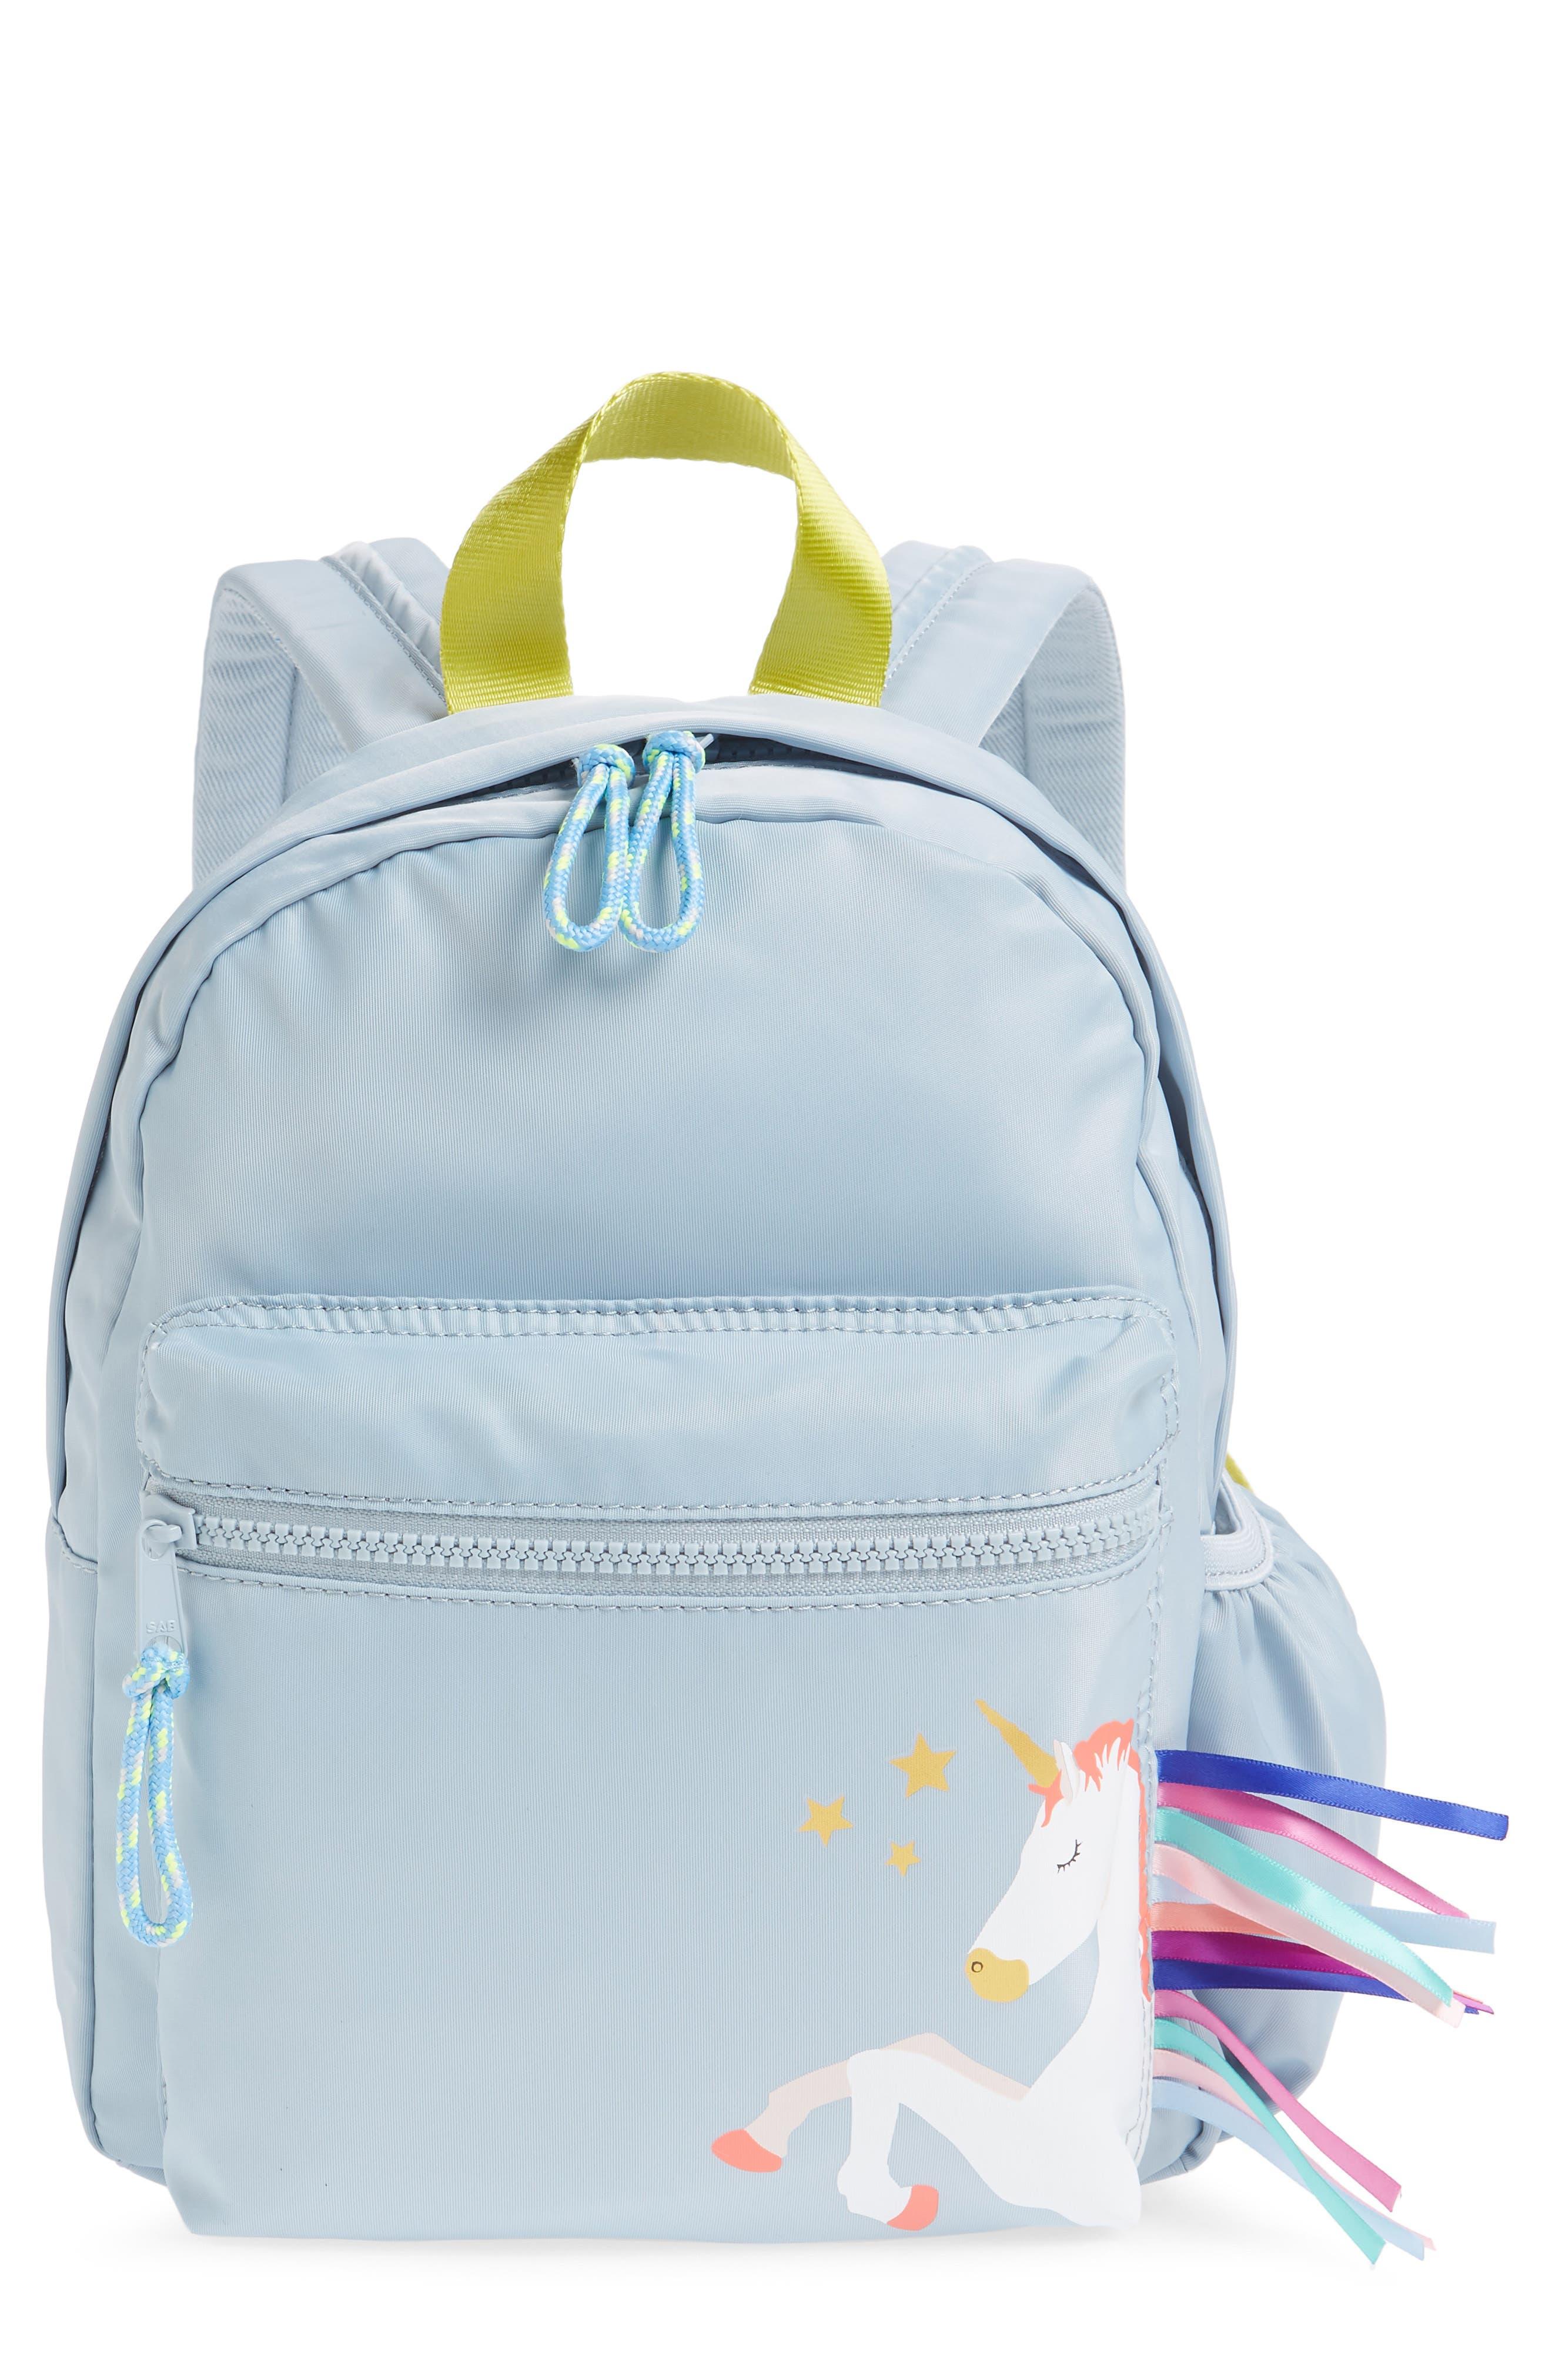 CREWCUTS BY J.CREW,                             Unicorn Mini Backpack,                             Main thumbnail 1, color,                             500